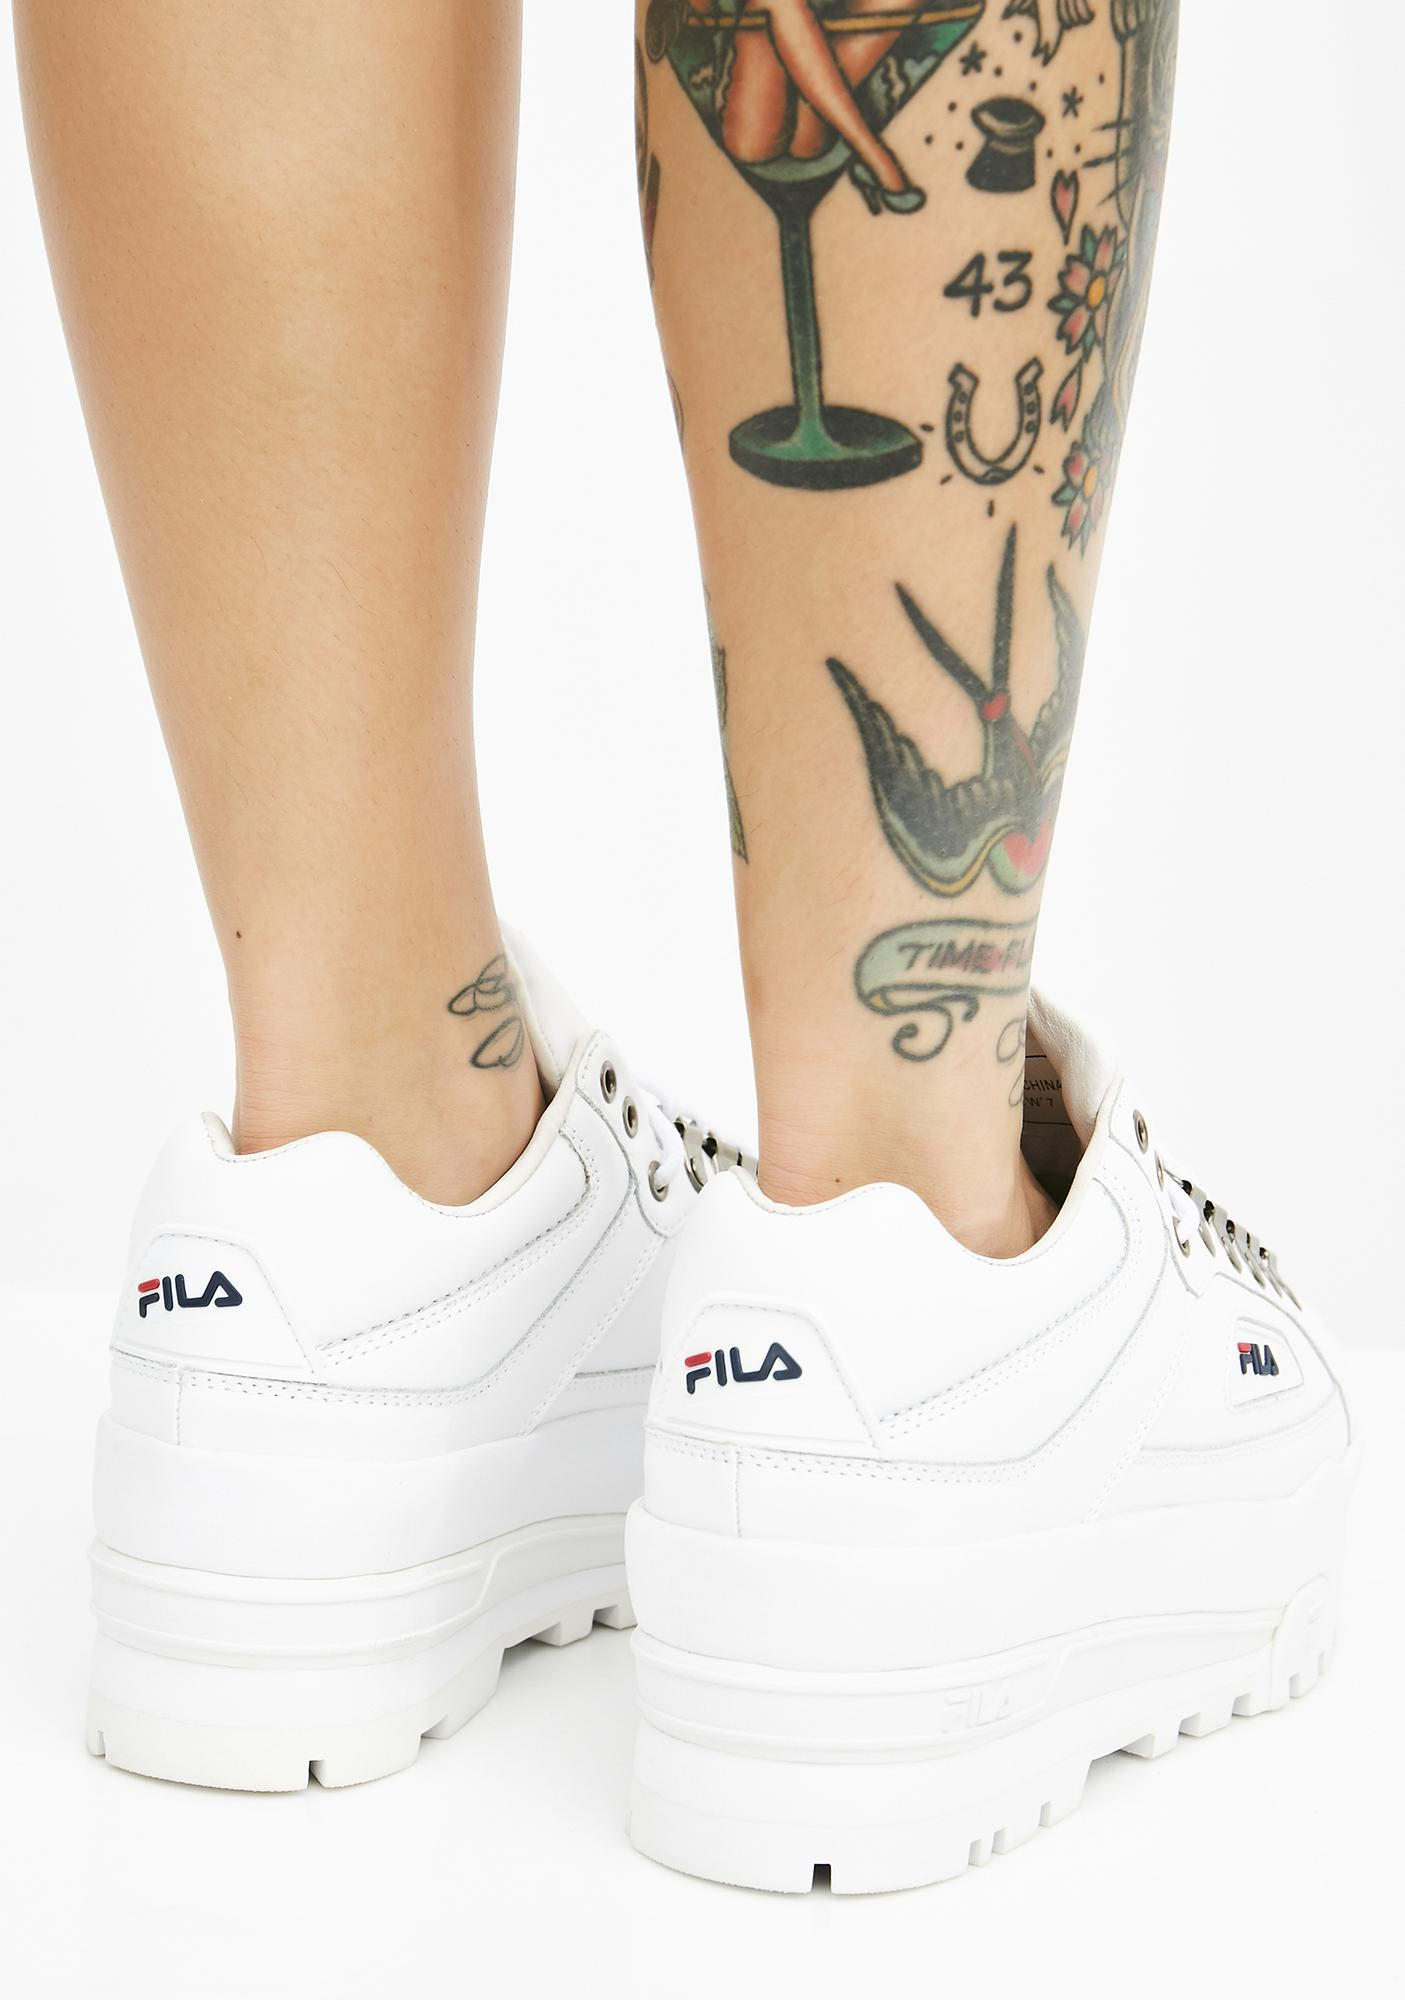 7e1a8070af5d ... Fila Icy Trailblazer Wedge Sneakers ...